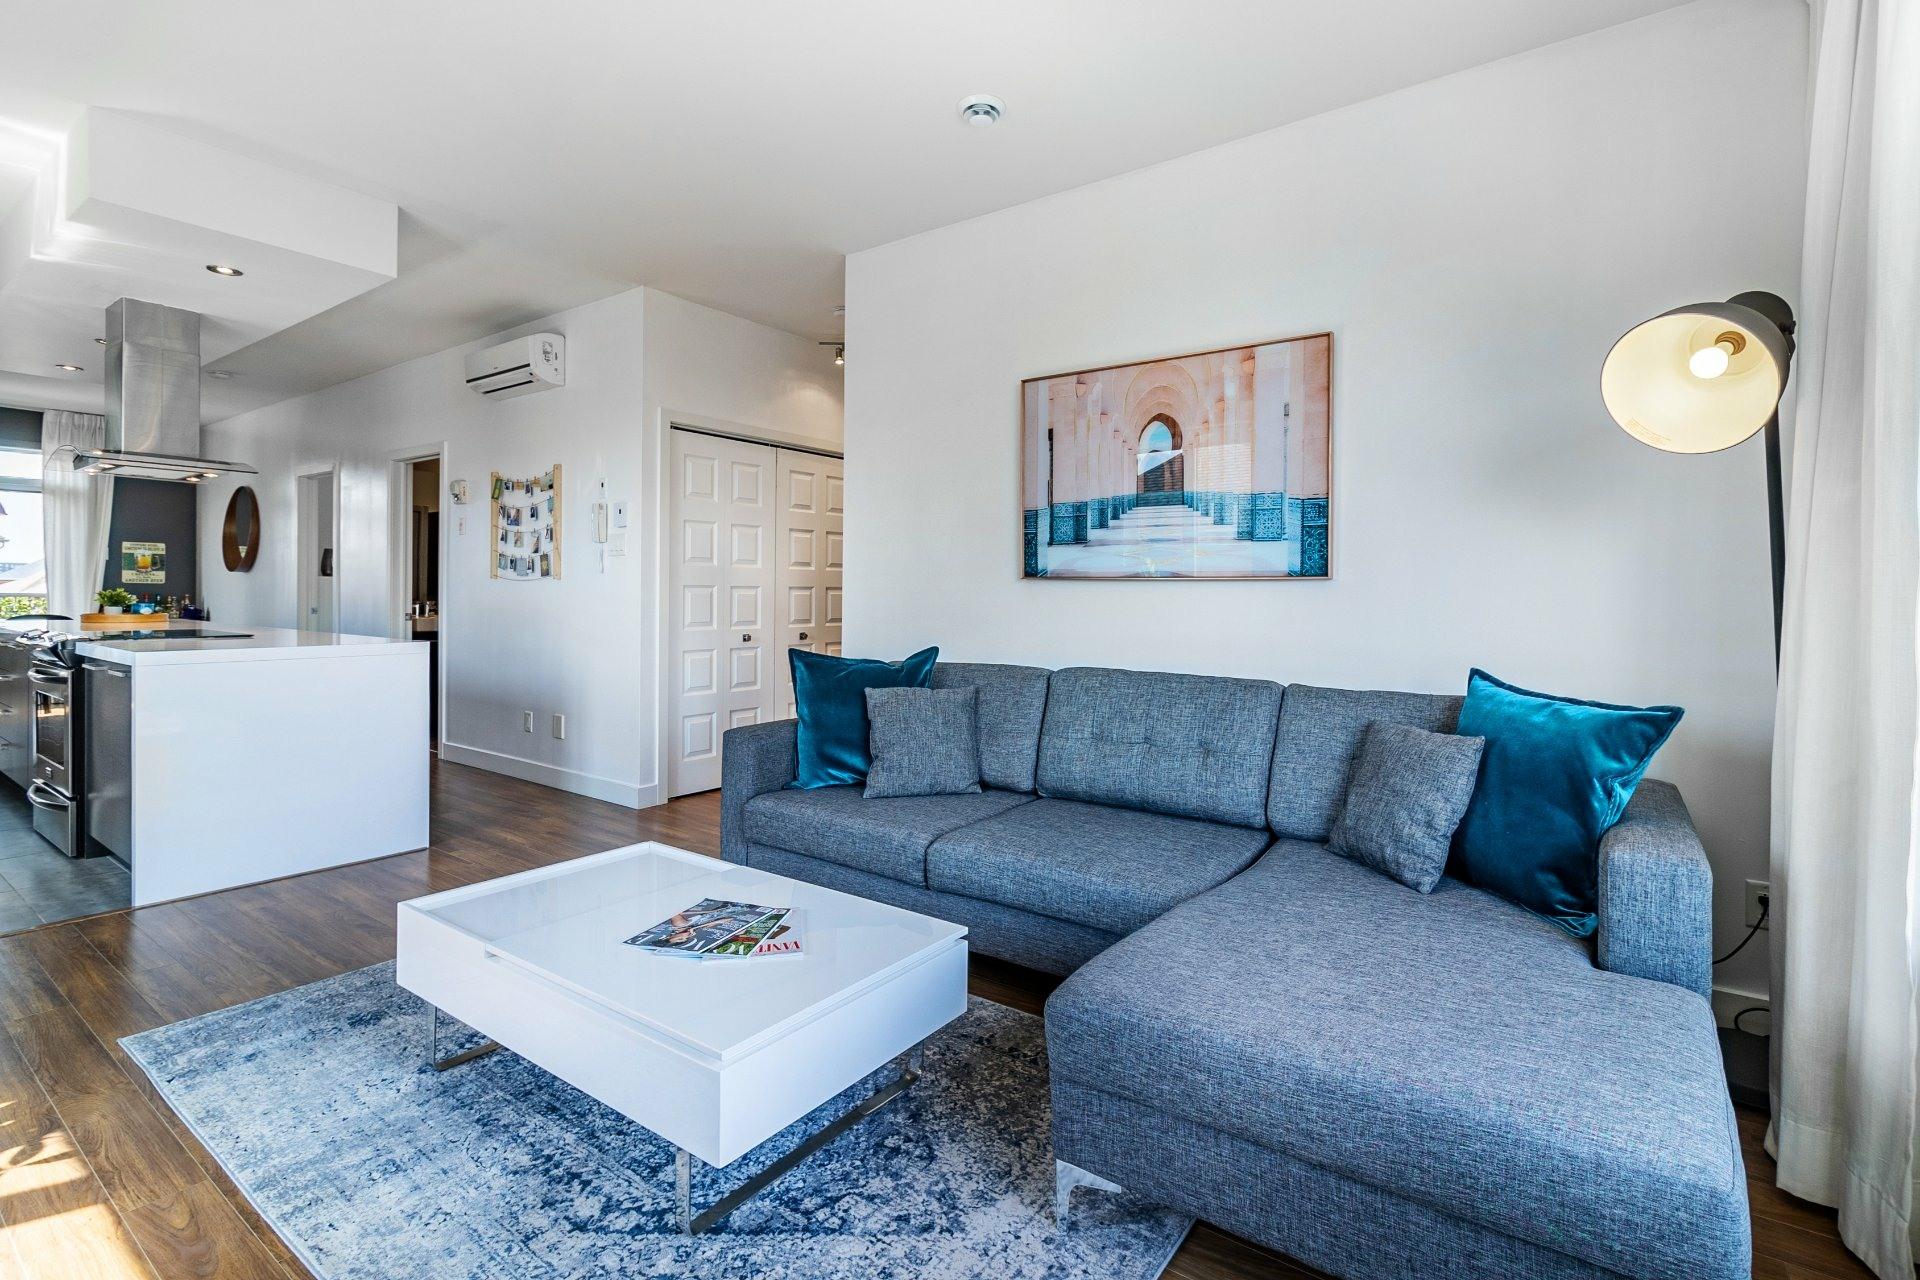 image 5 - Apartment For sale Saint-Hubert Longueuil  - 7 rooms